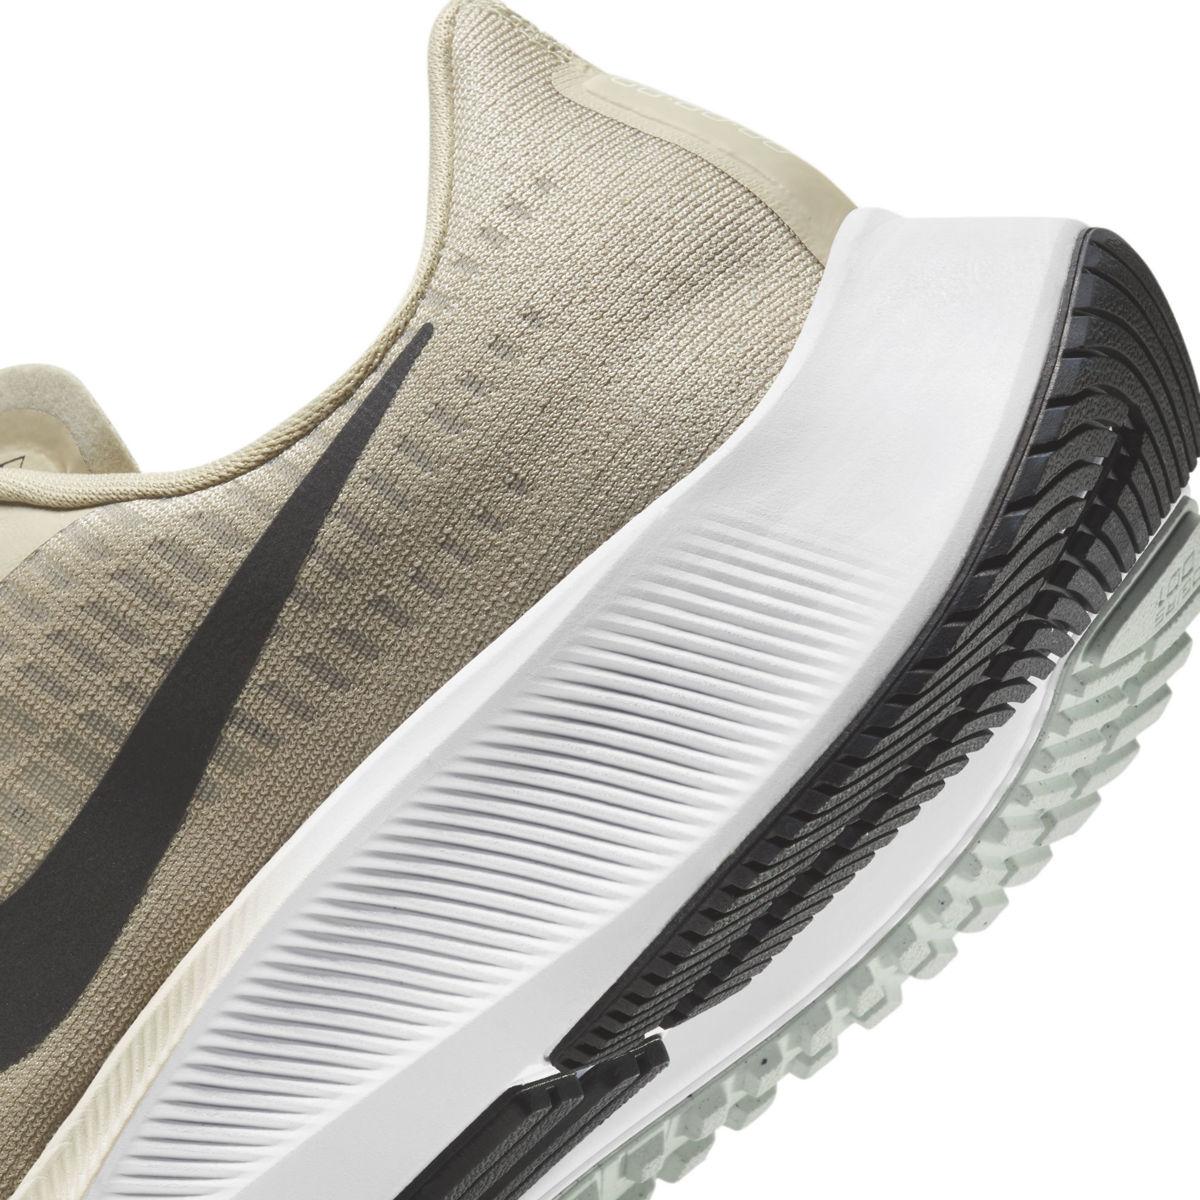 Bilde av Nike Air zoom Pegasus 37 BQ9646-200